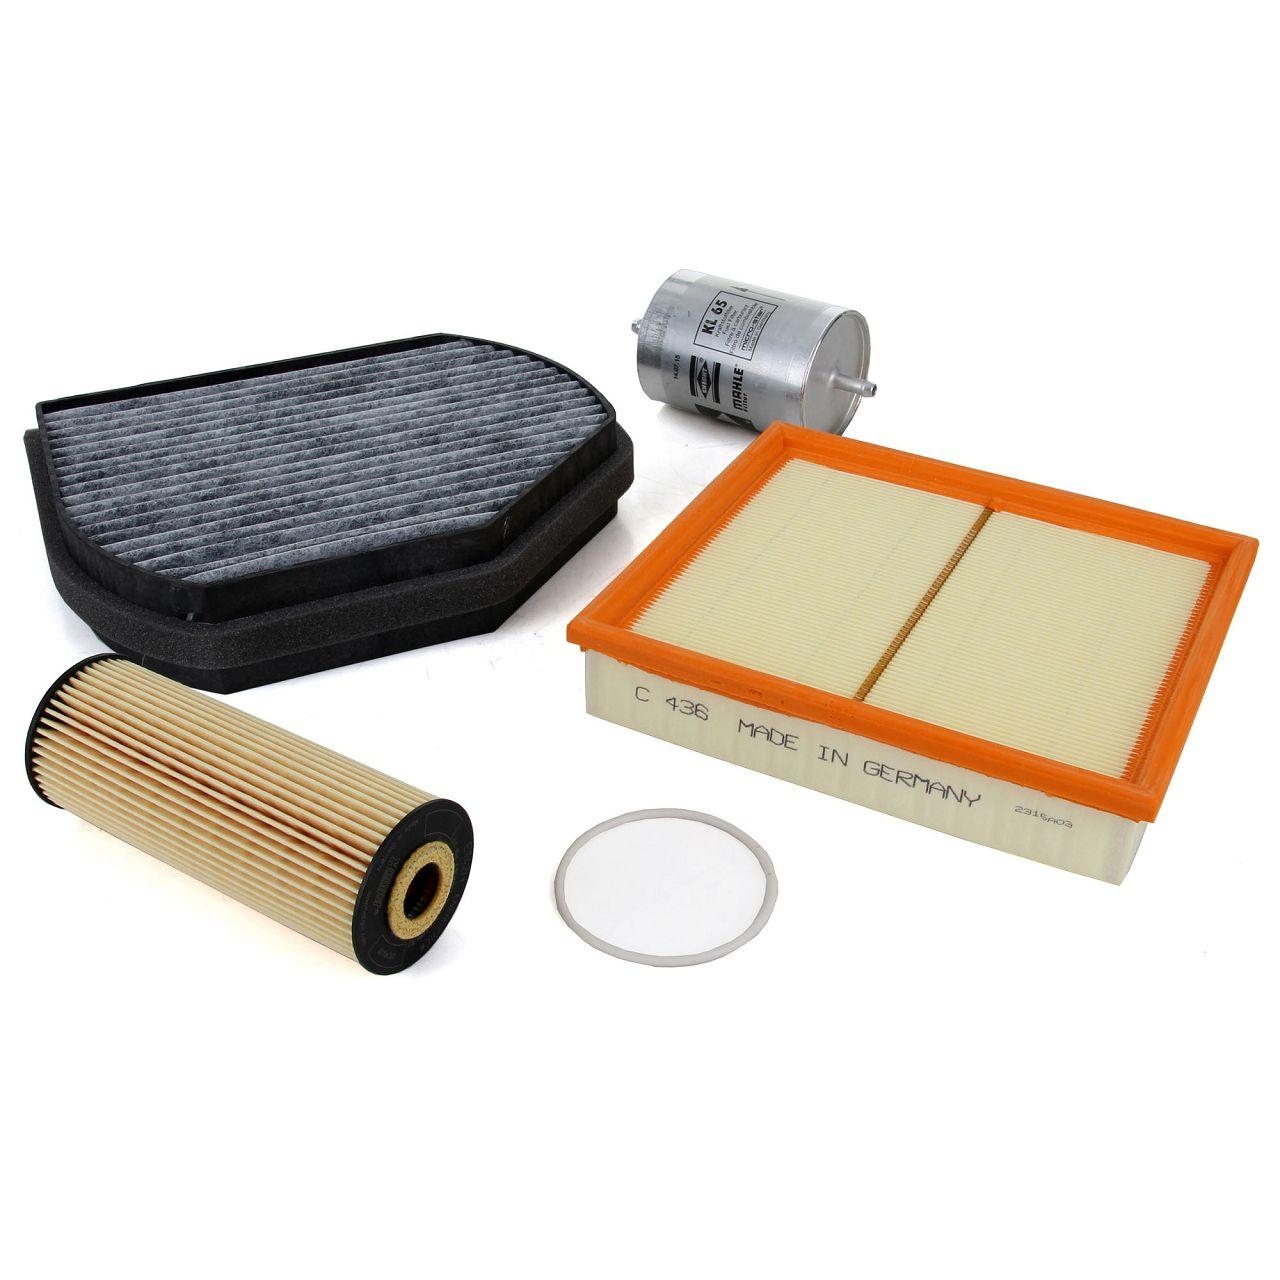 Inspektionskit 4-tlg MERCEDES SLK R170 200 + 200/230 Kompressor 136/192/193PS M111